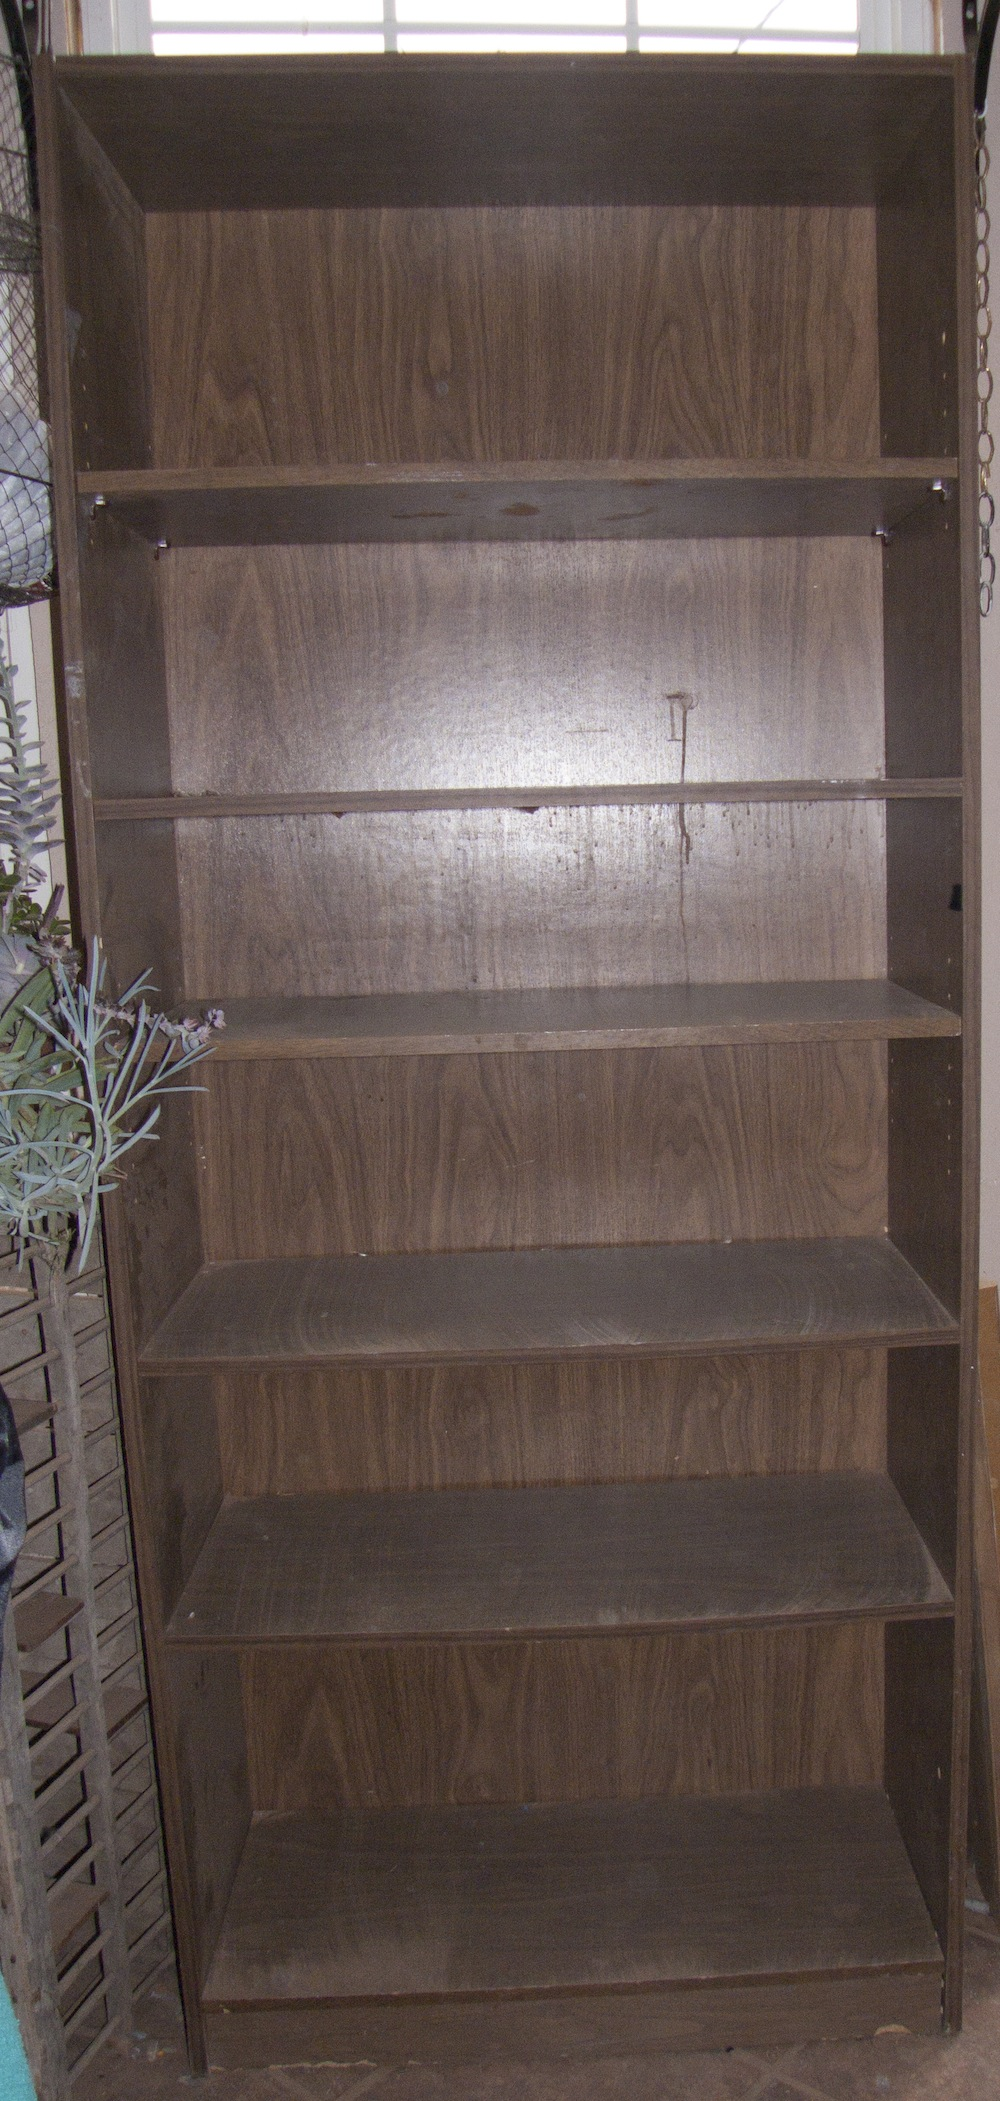 Cutomizing a Goodwill Bookcase